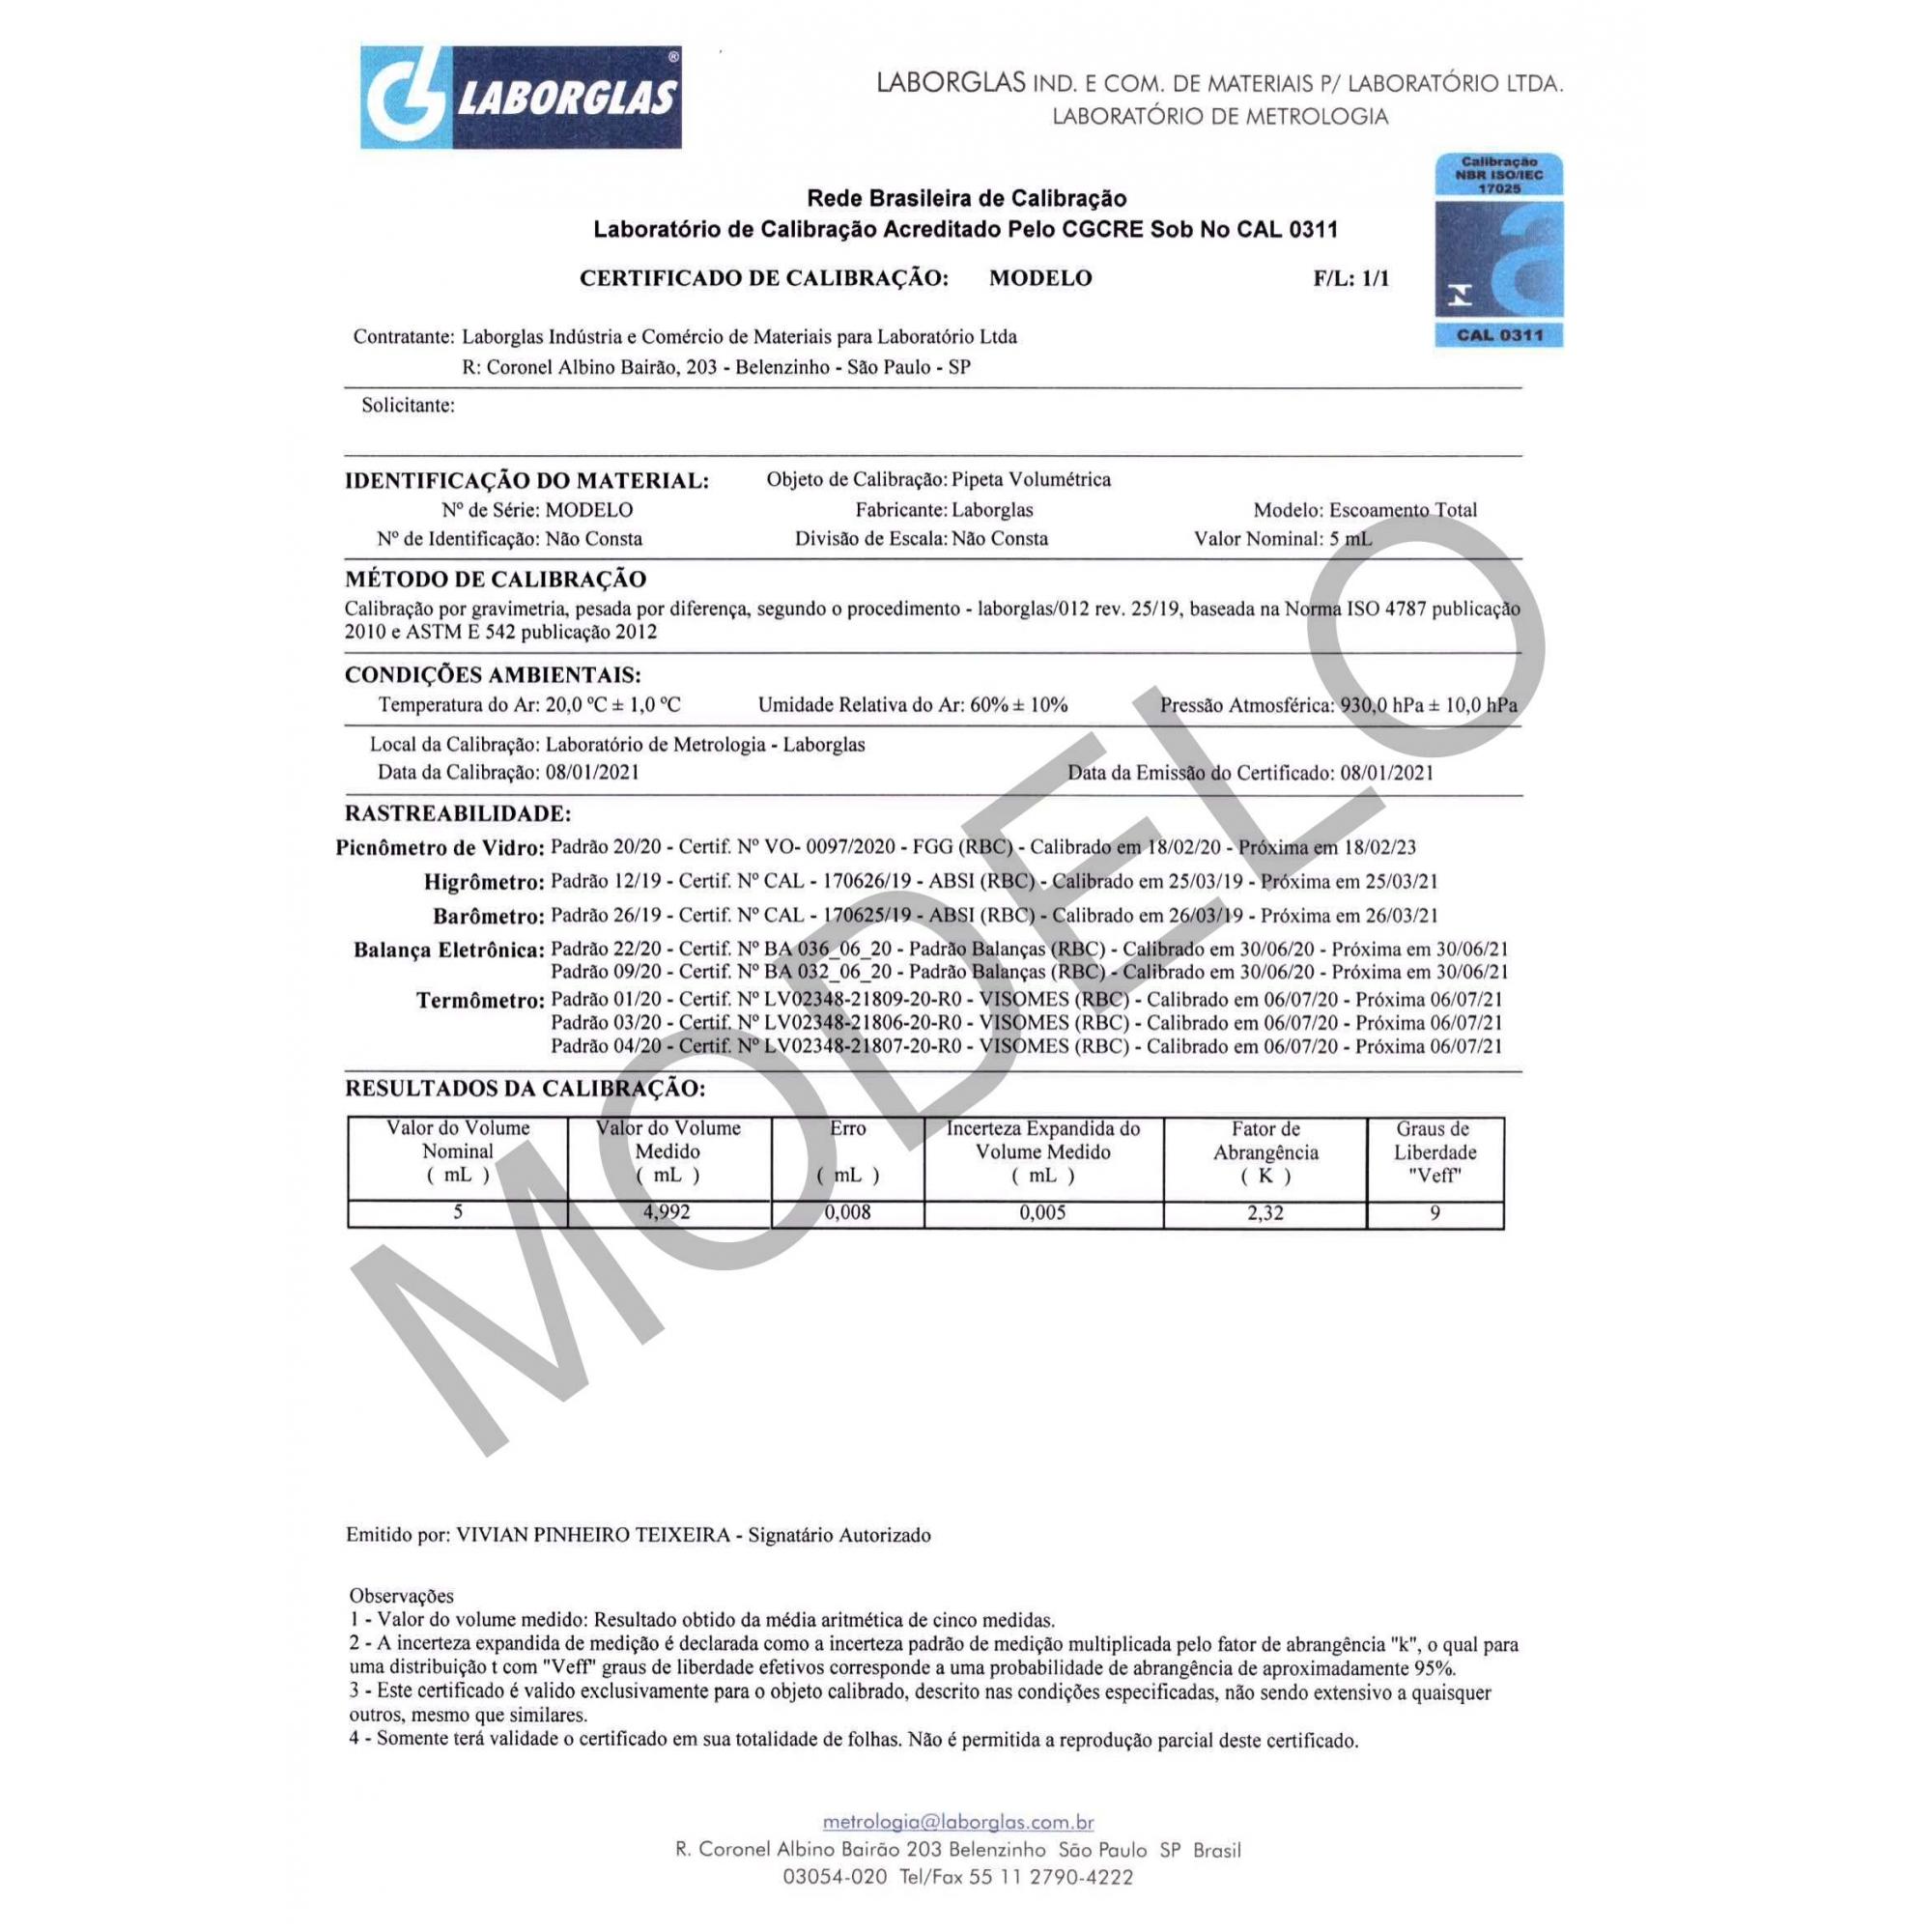 PIPETA VOLUMÉTRICA ESGOTAMENTO TOTAL 80 ML CERTIFICADO RBC - Laborglas - Cód. 9433731-R